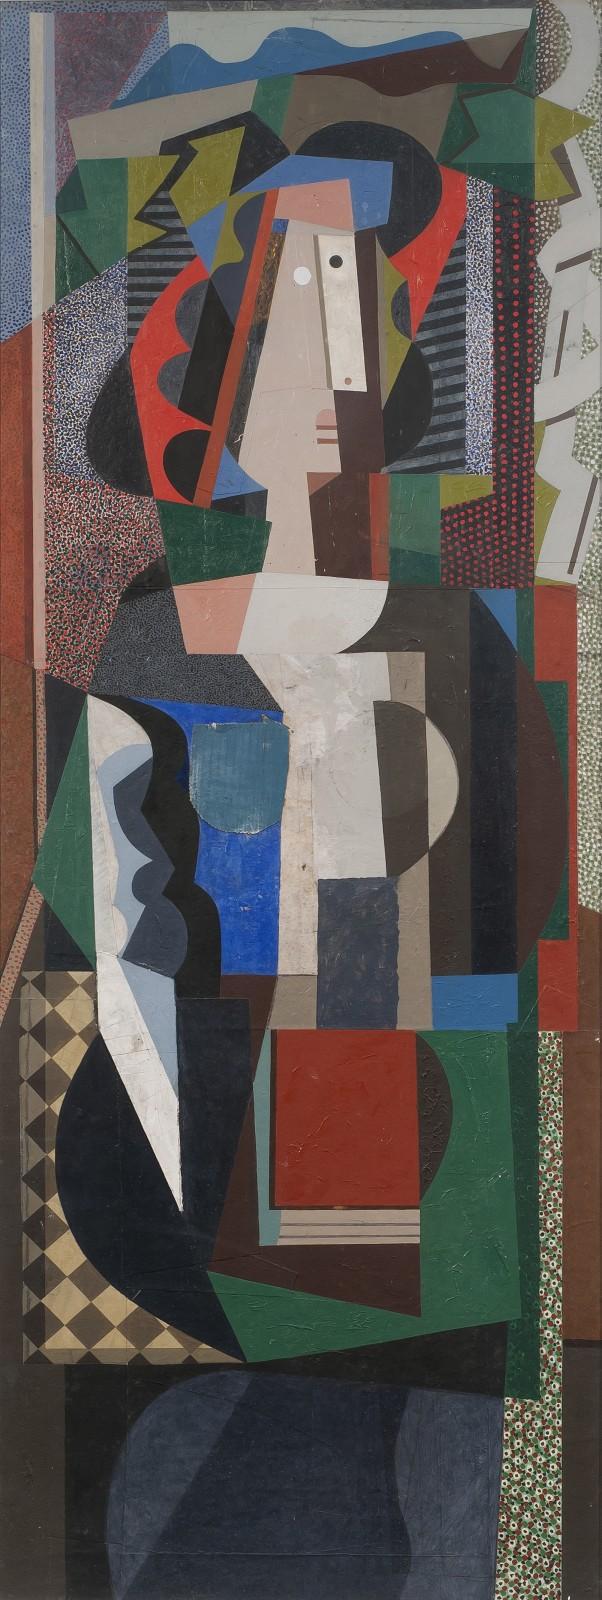 Bryan Ingham  Aysel Ozakin, Rue de Seine, 1991  Oil and collage on board  137 x 51 cm